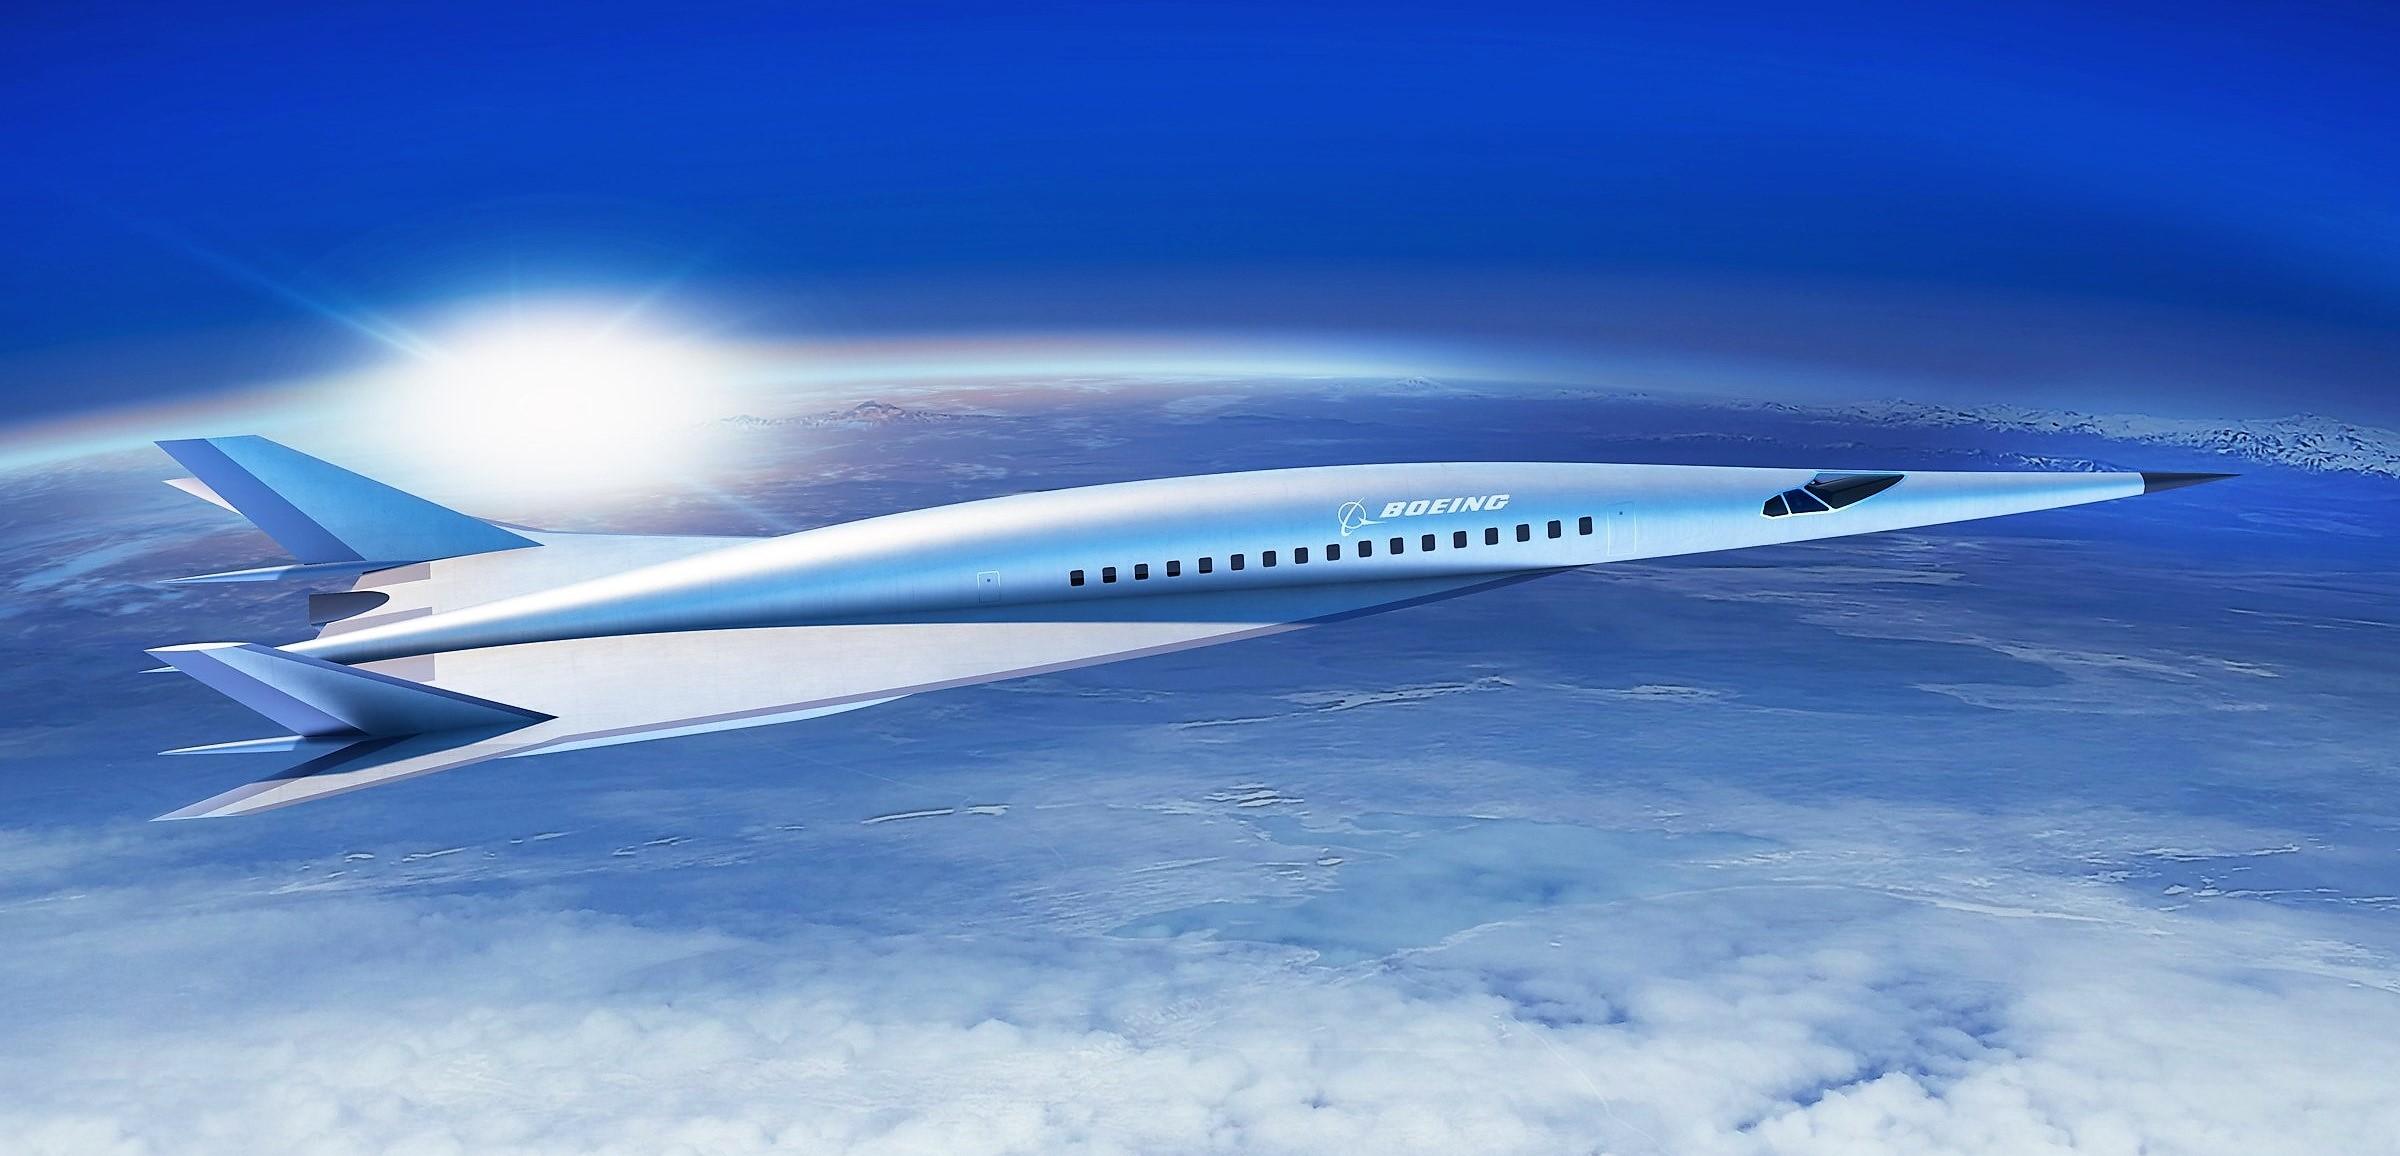 Boeing unviels its sleek hypersonic jet